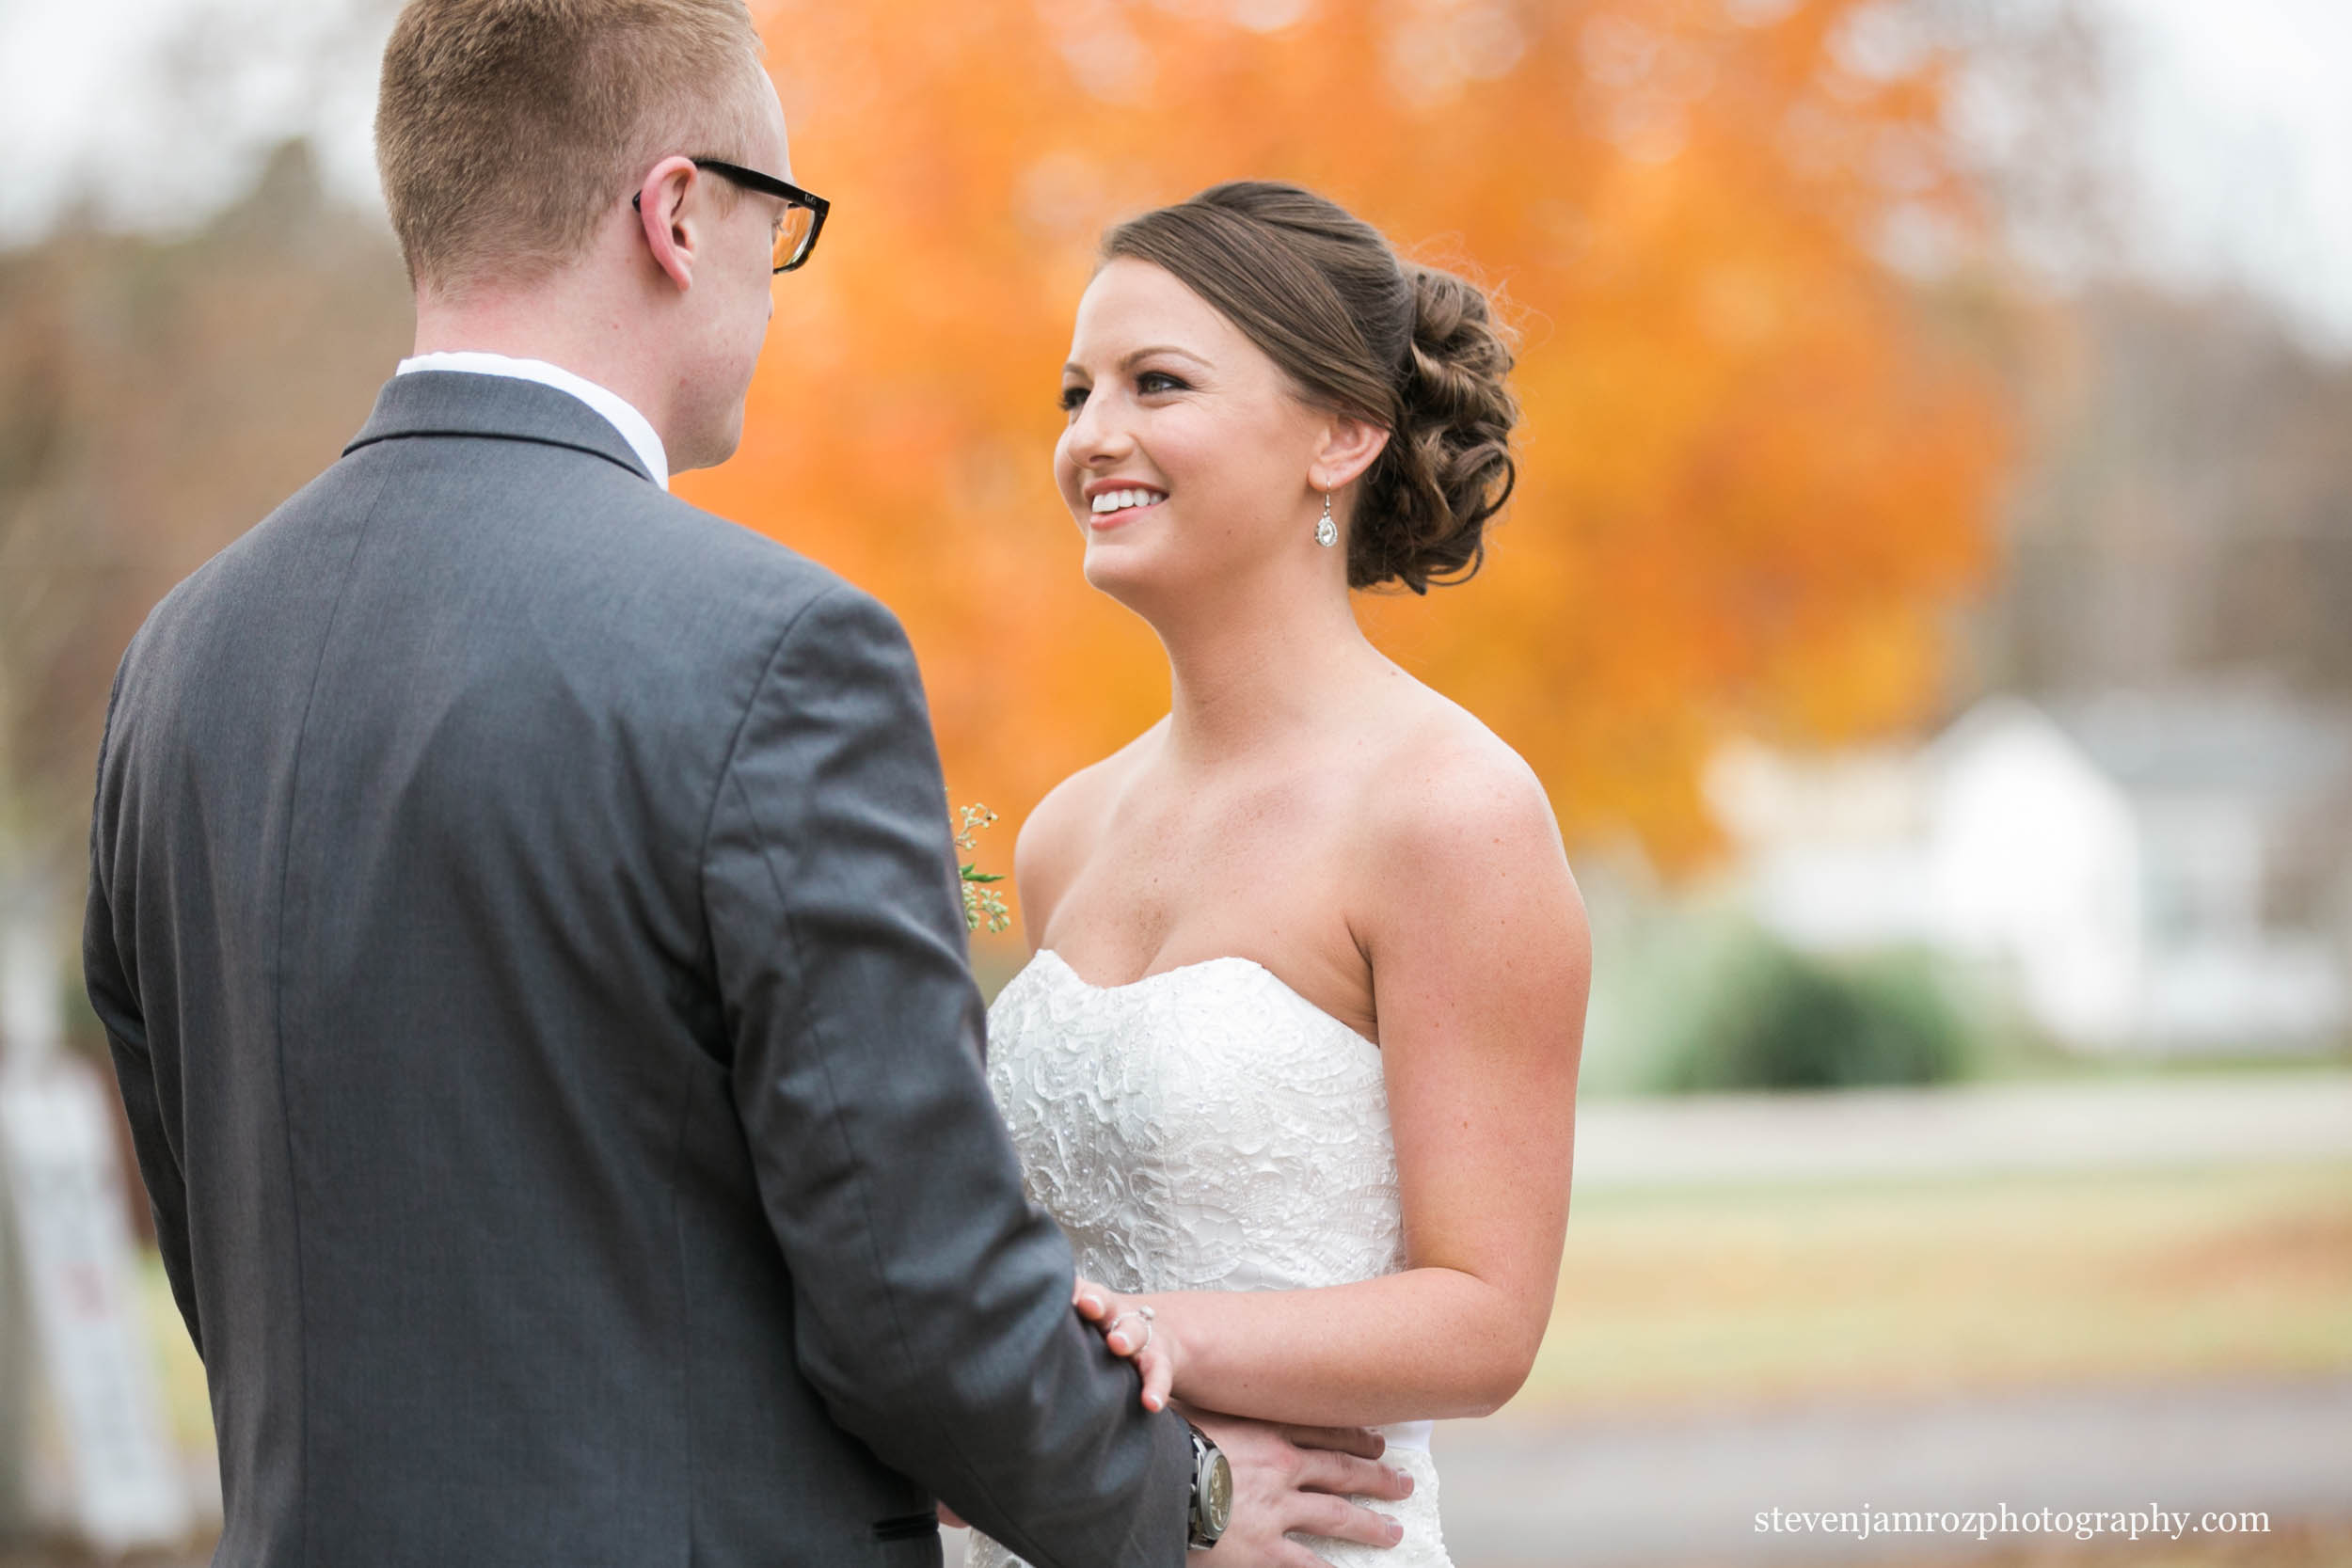 holding-hands-bride-groom-hudson-manor-steven-jamroz-photography-0024.jpg